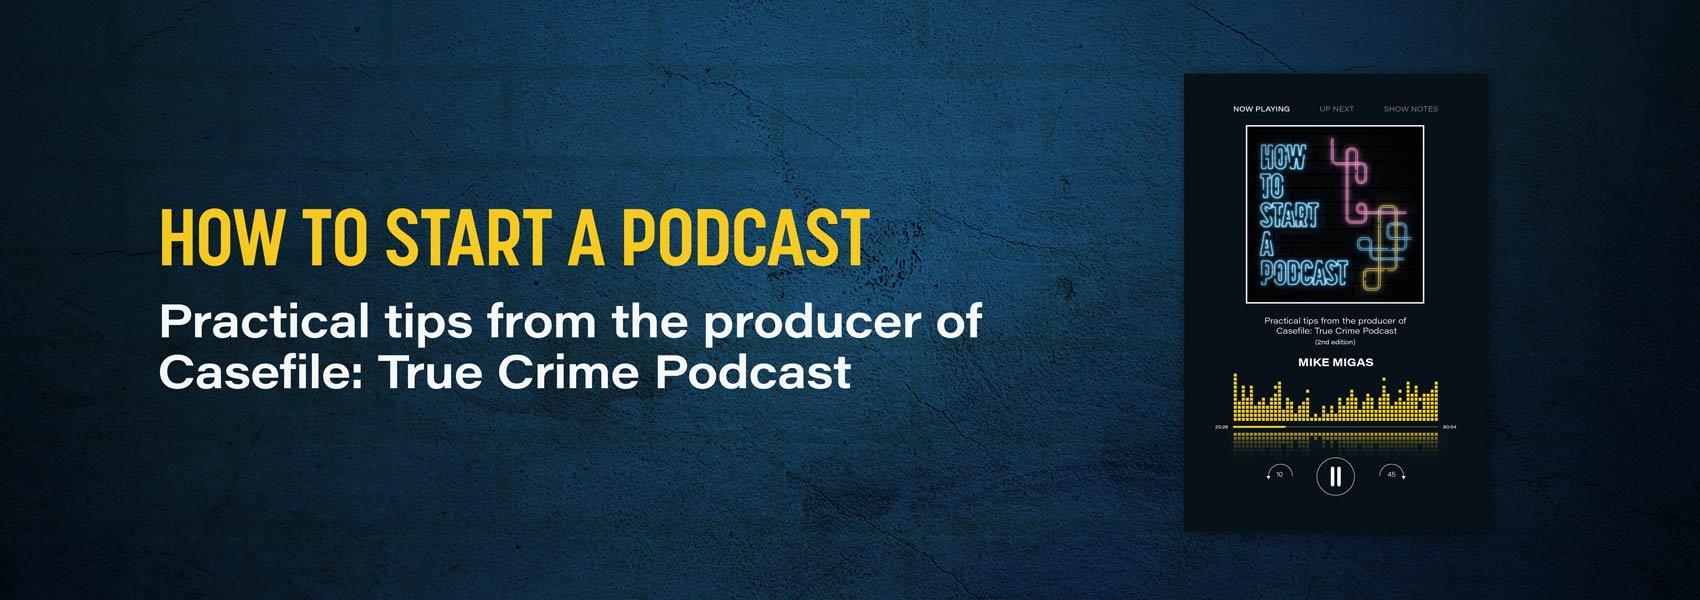 Mike-Migas-How-to-Start-a-Podcast-book-website-header-desktop